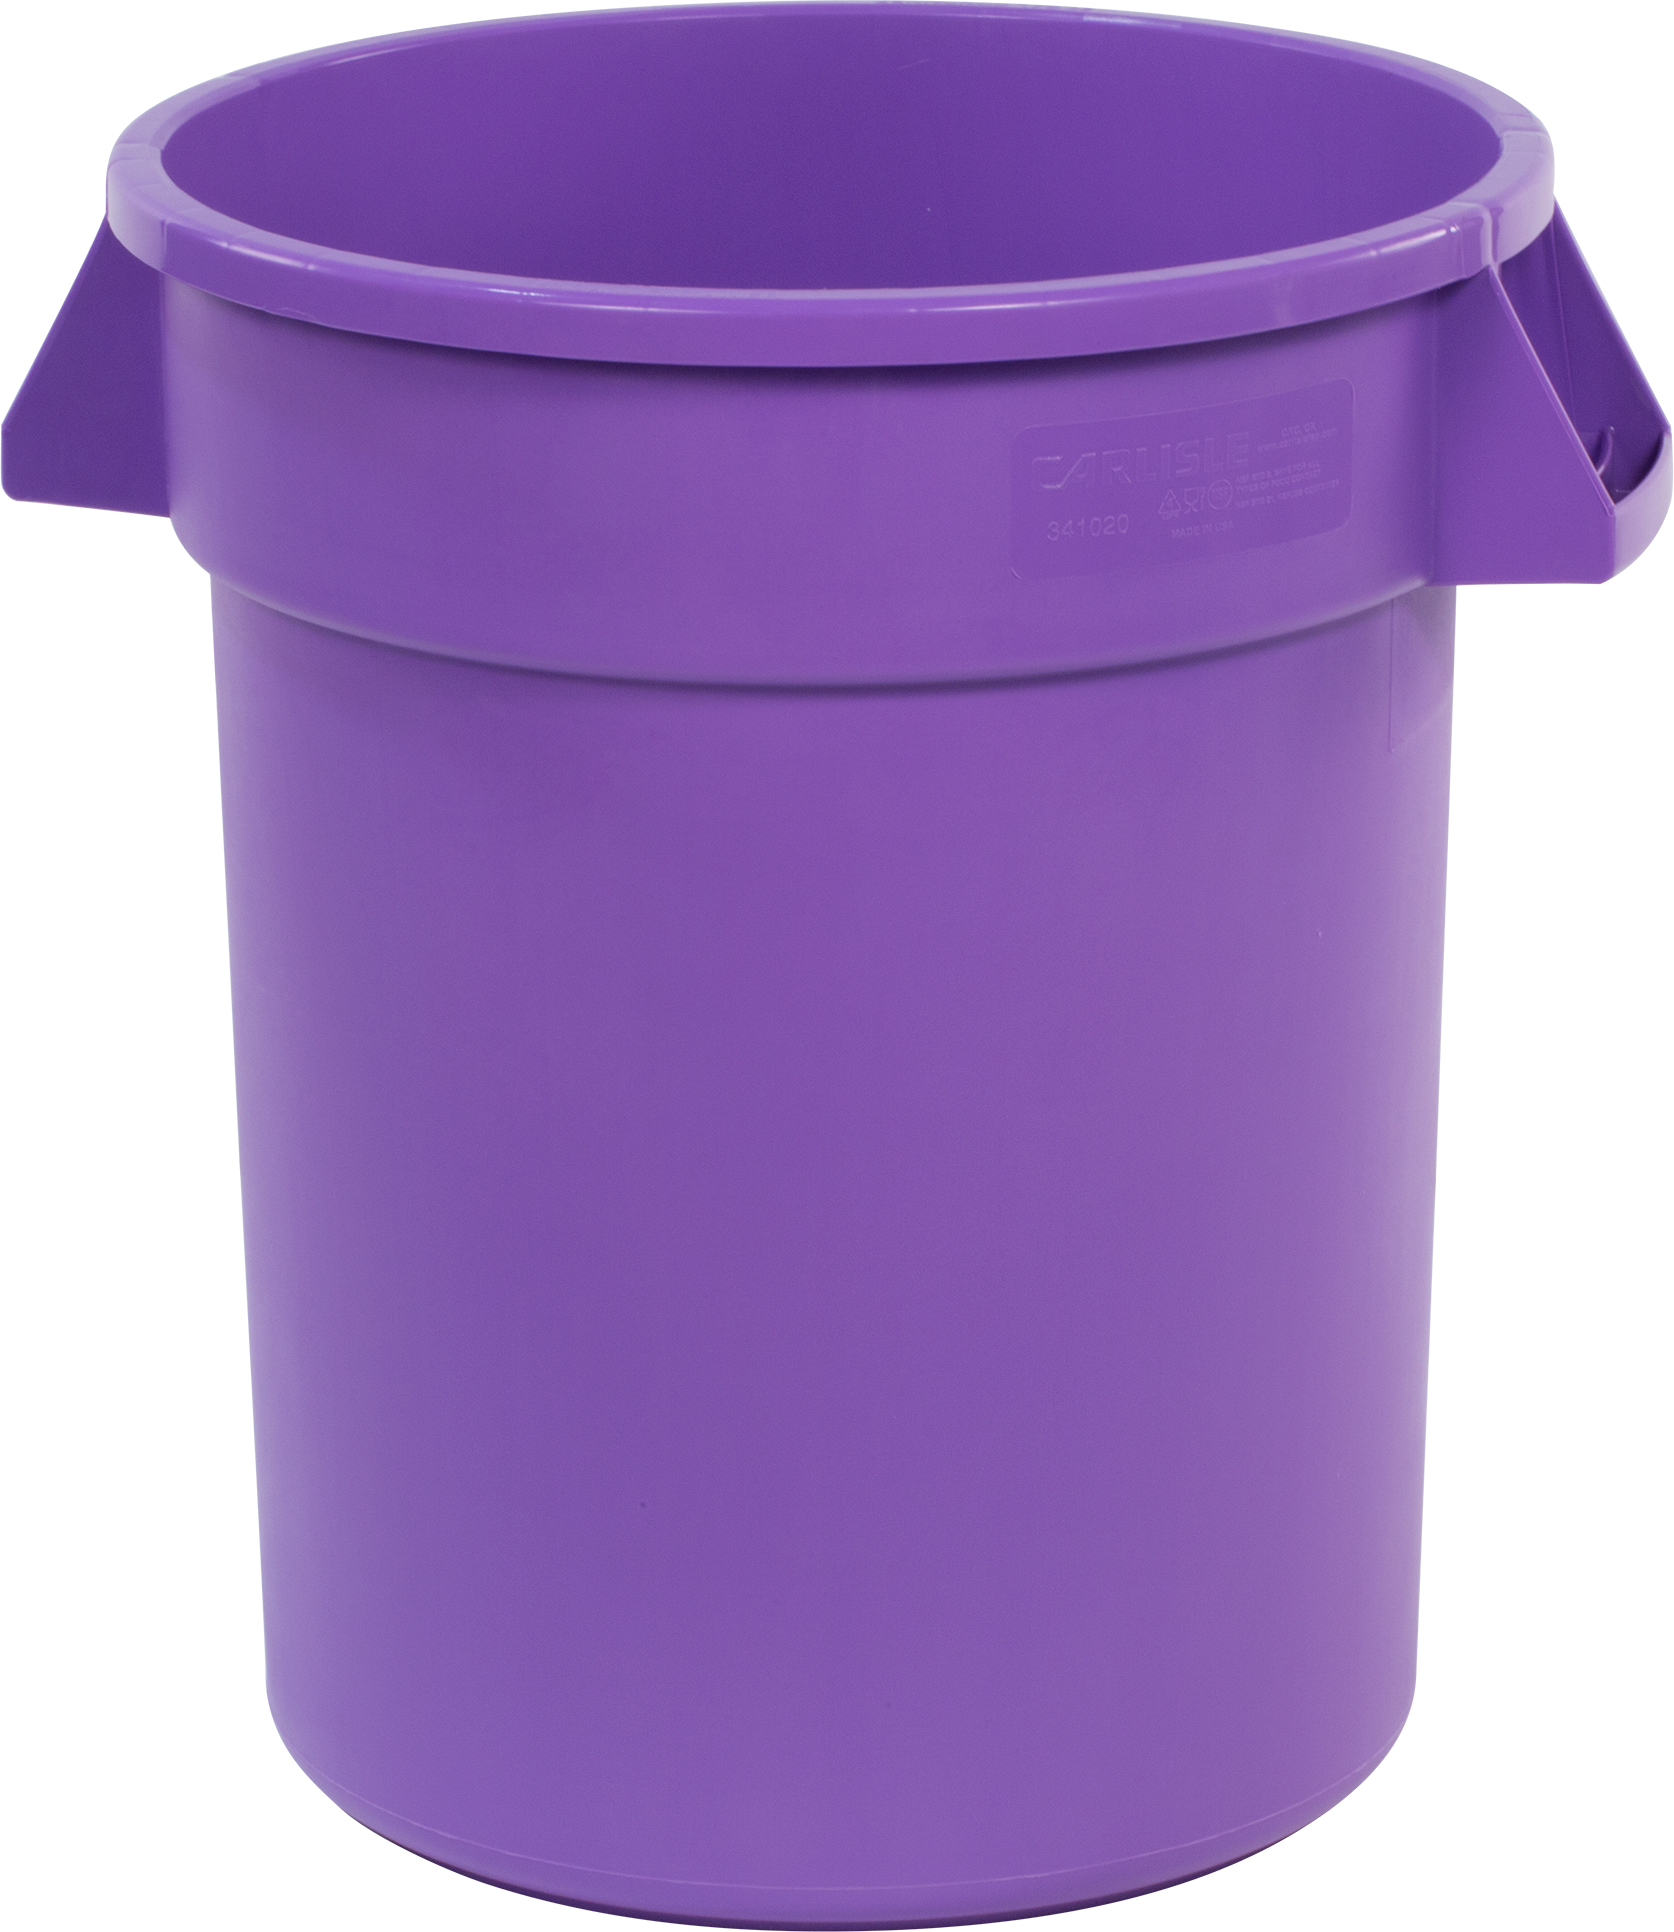 Bronco Round Waste Bin Food Container 20 Gallon - Purple